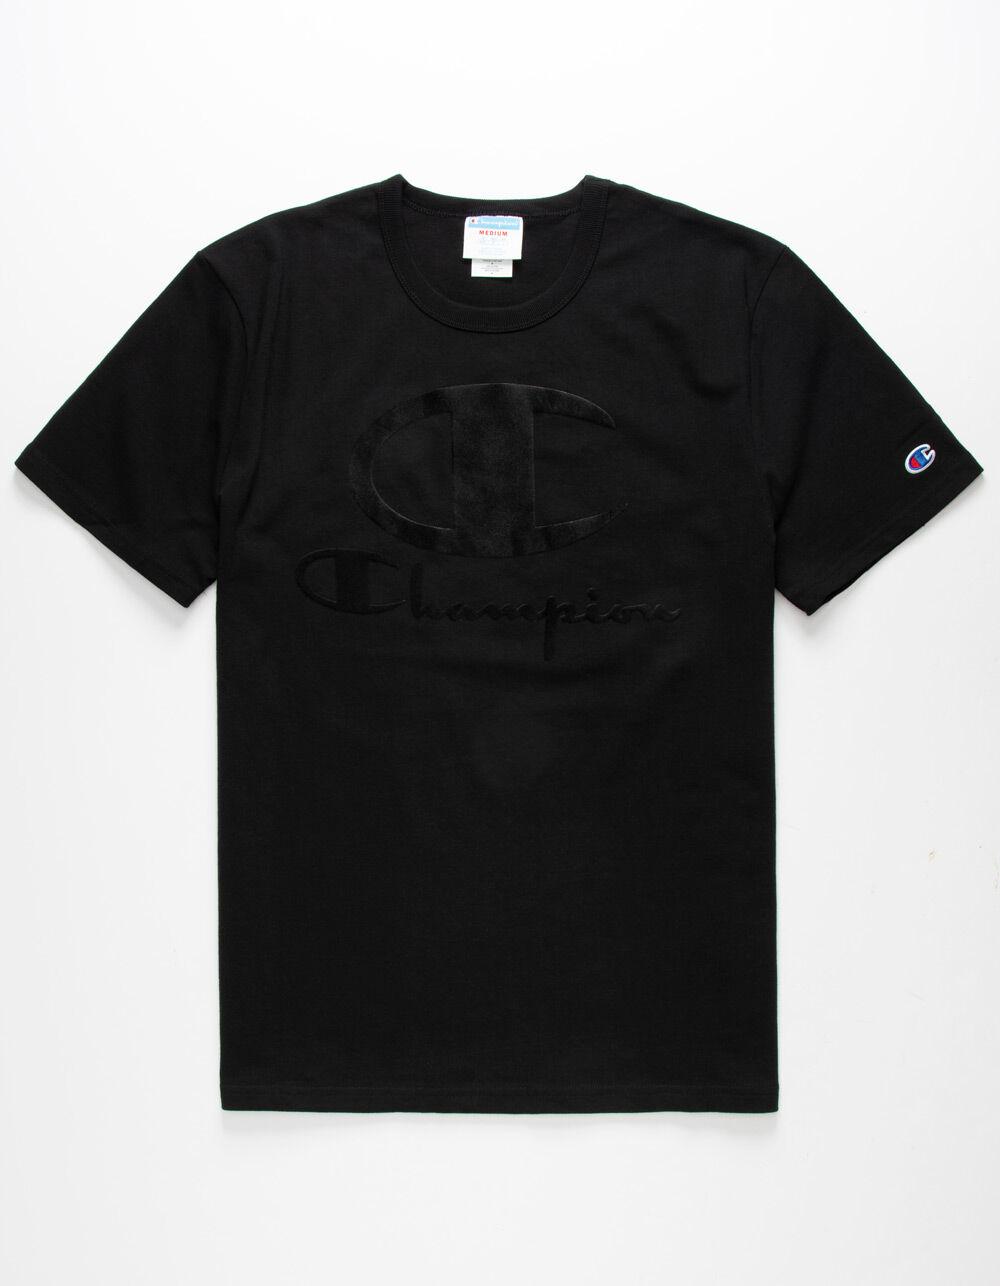 CHAMPION Furry Champion Logo Black T-Shirt